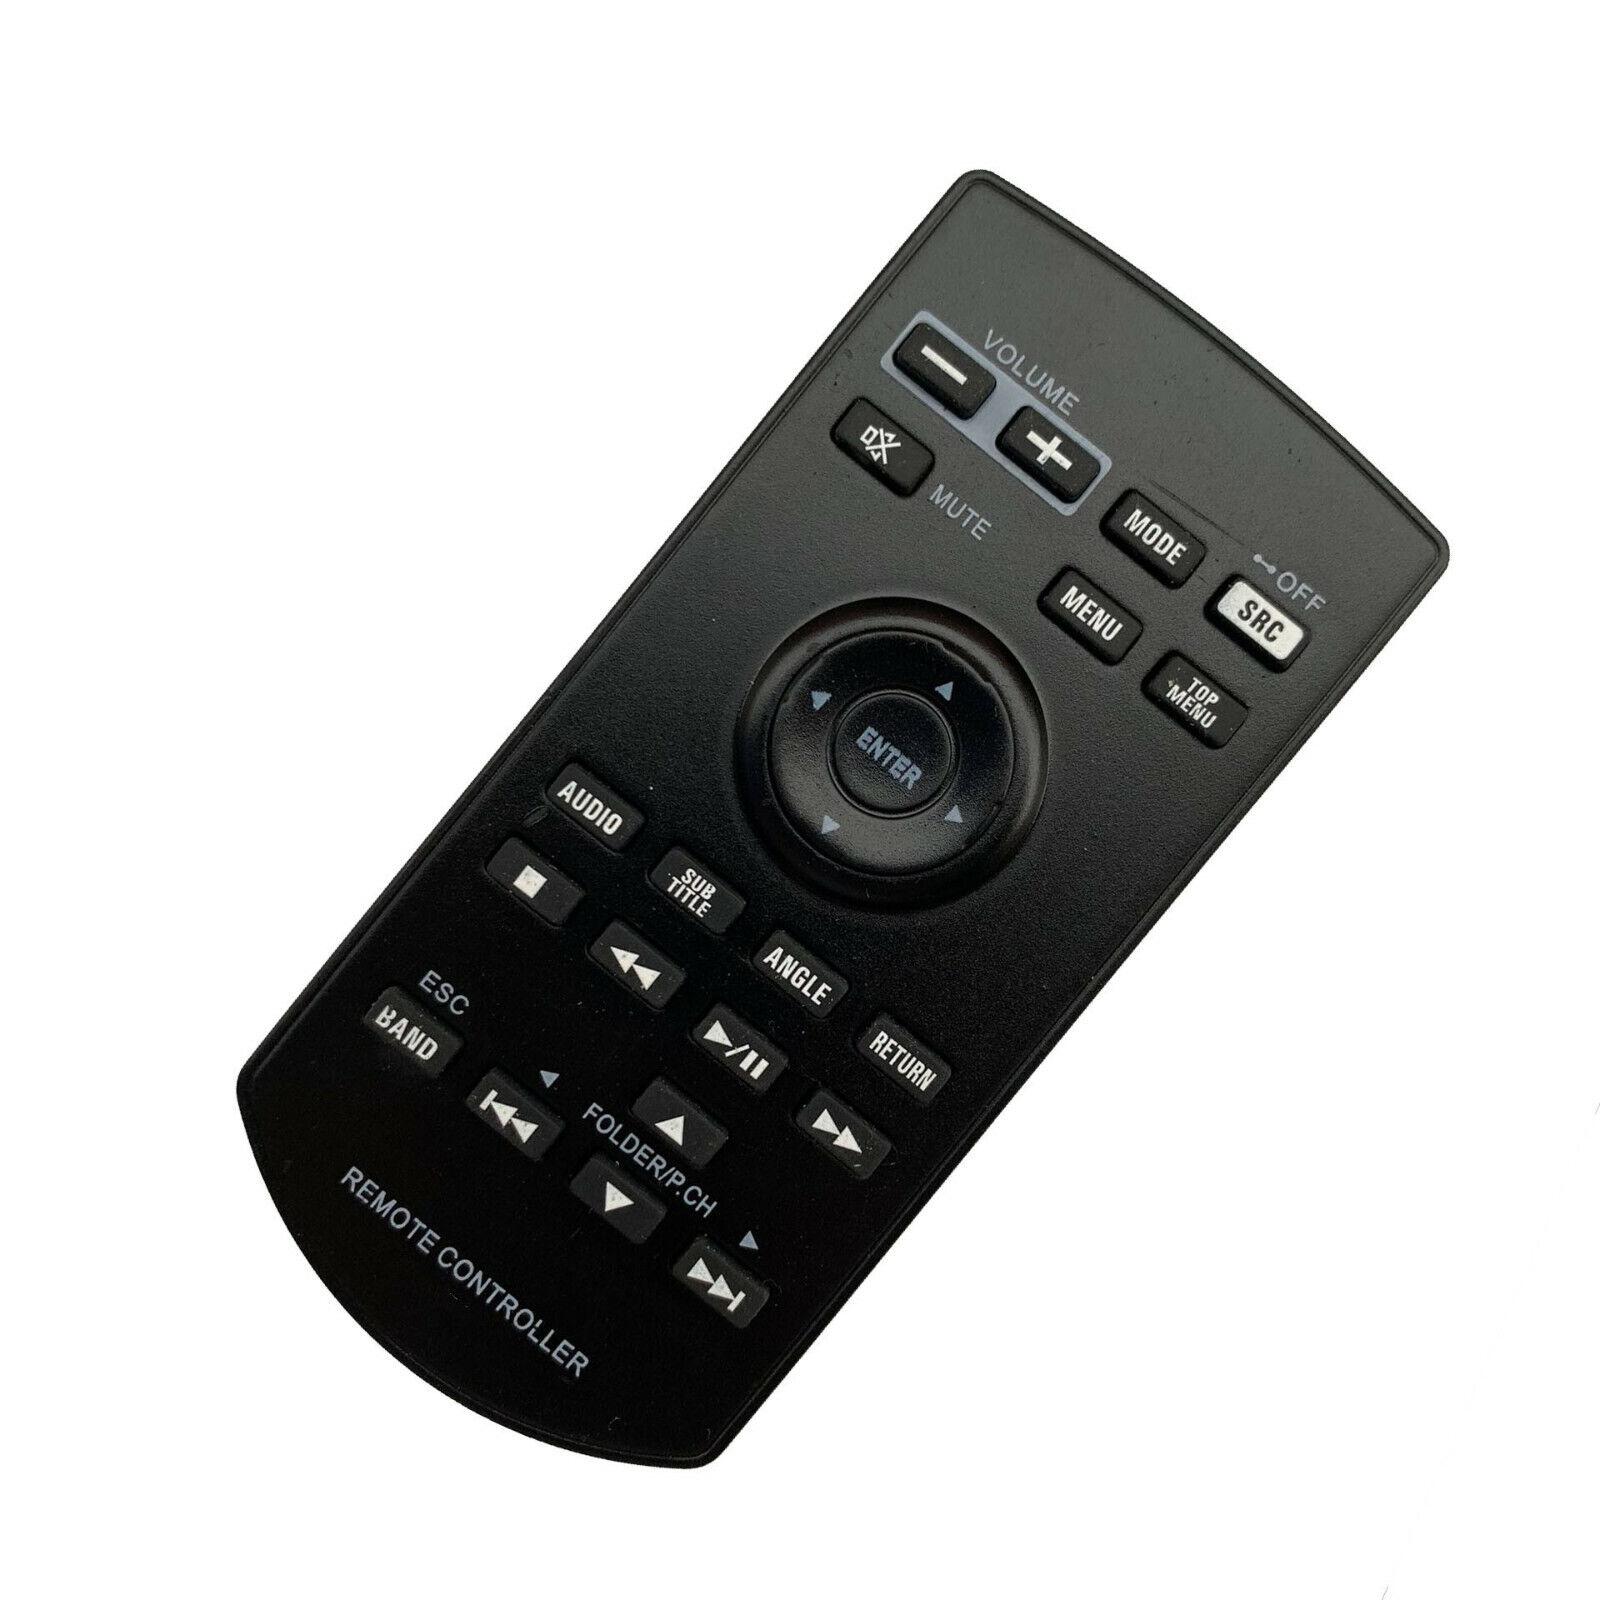 USA Remote Control For Pioneer AVH-290BT AVH-X490BS AVH-2330